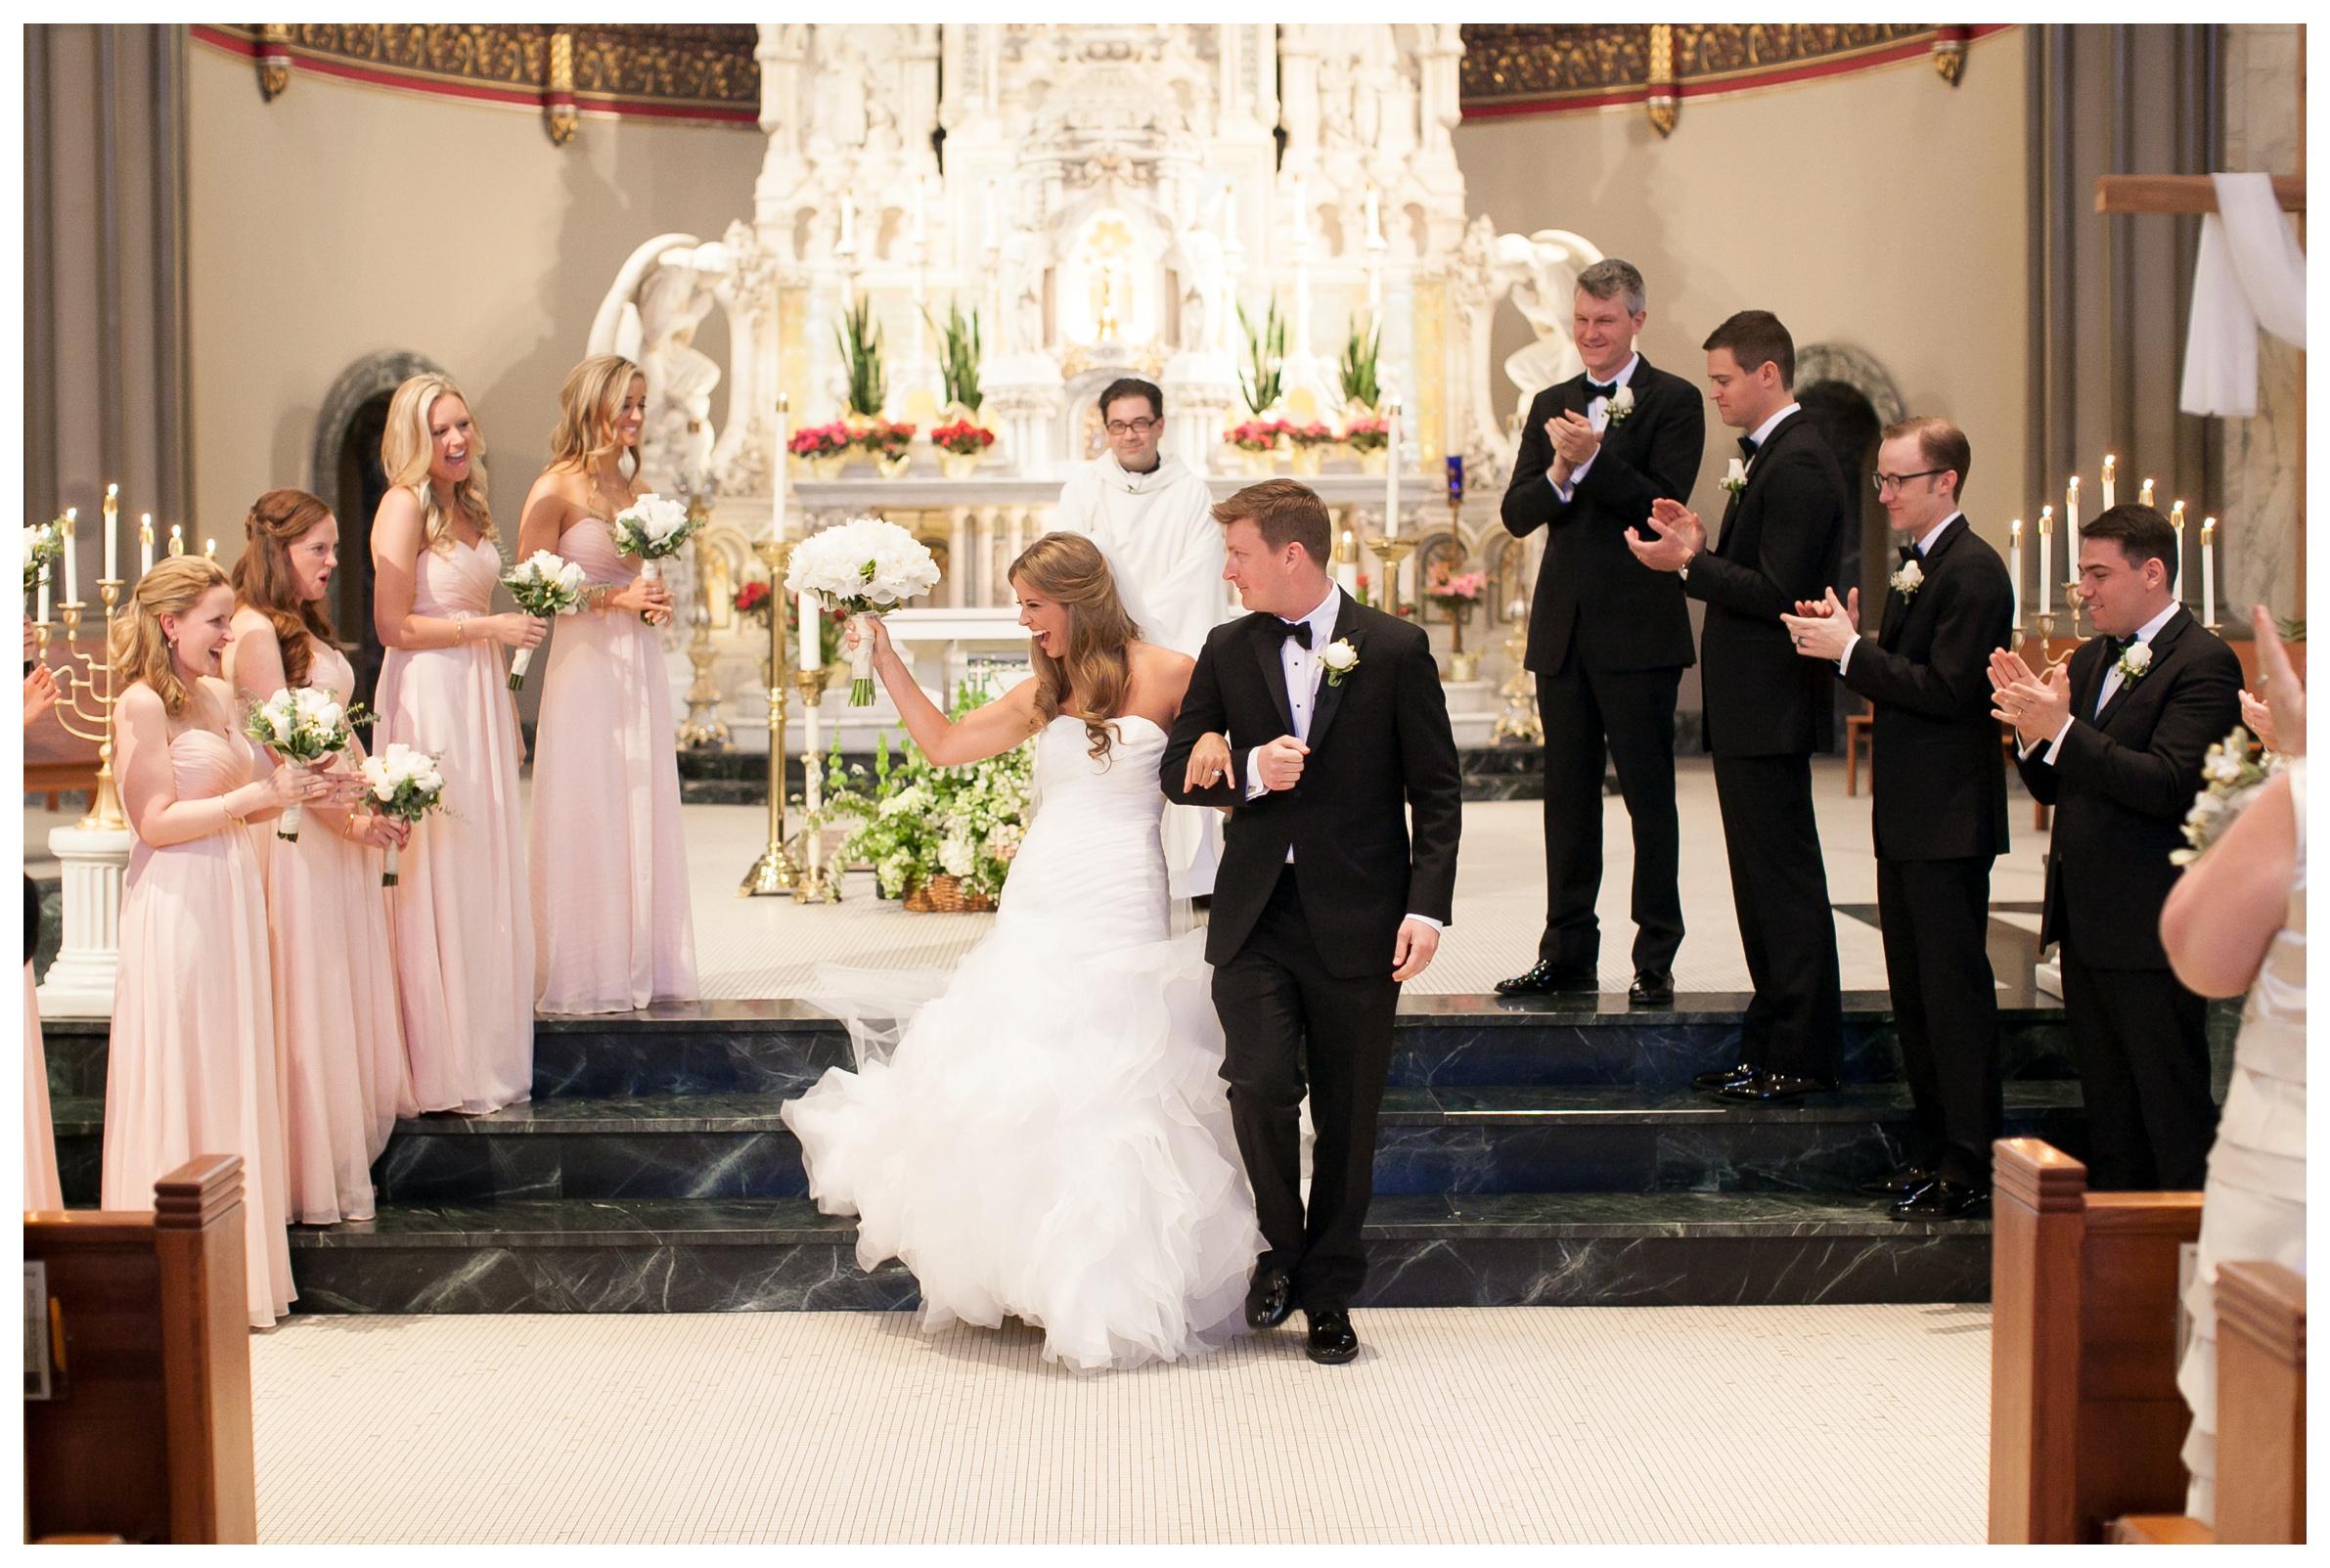 st-vincent-depaul-wedding-pictures